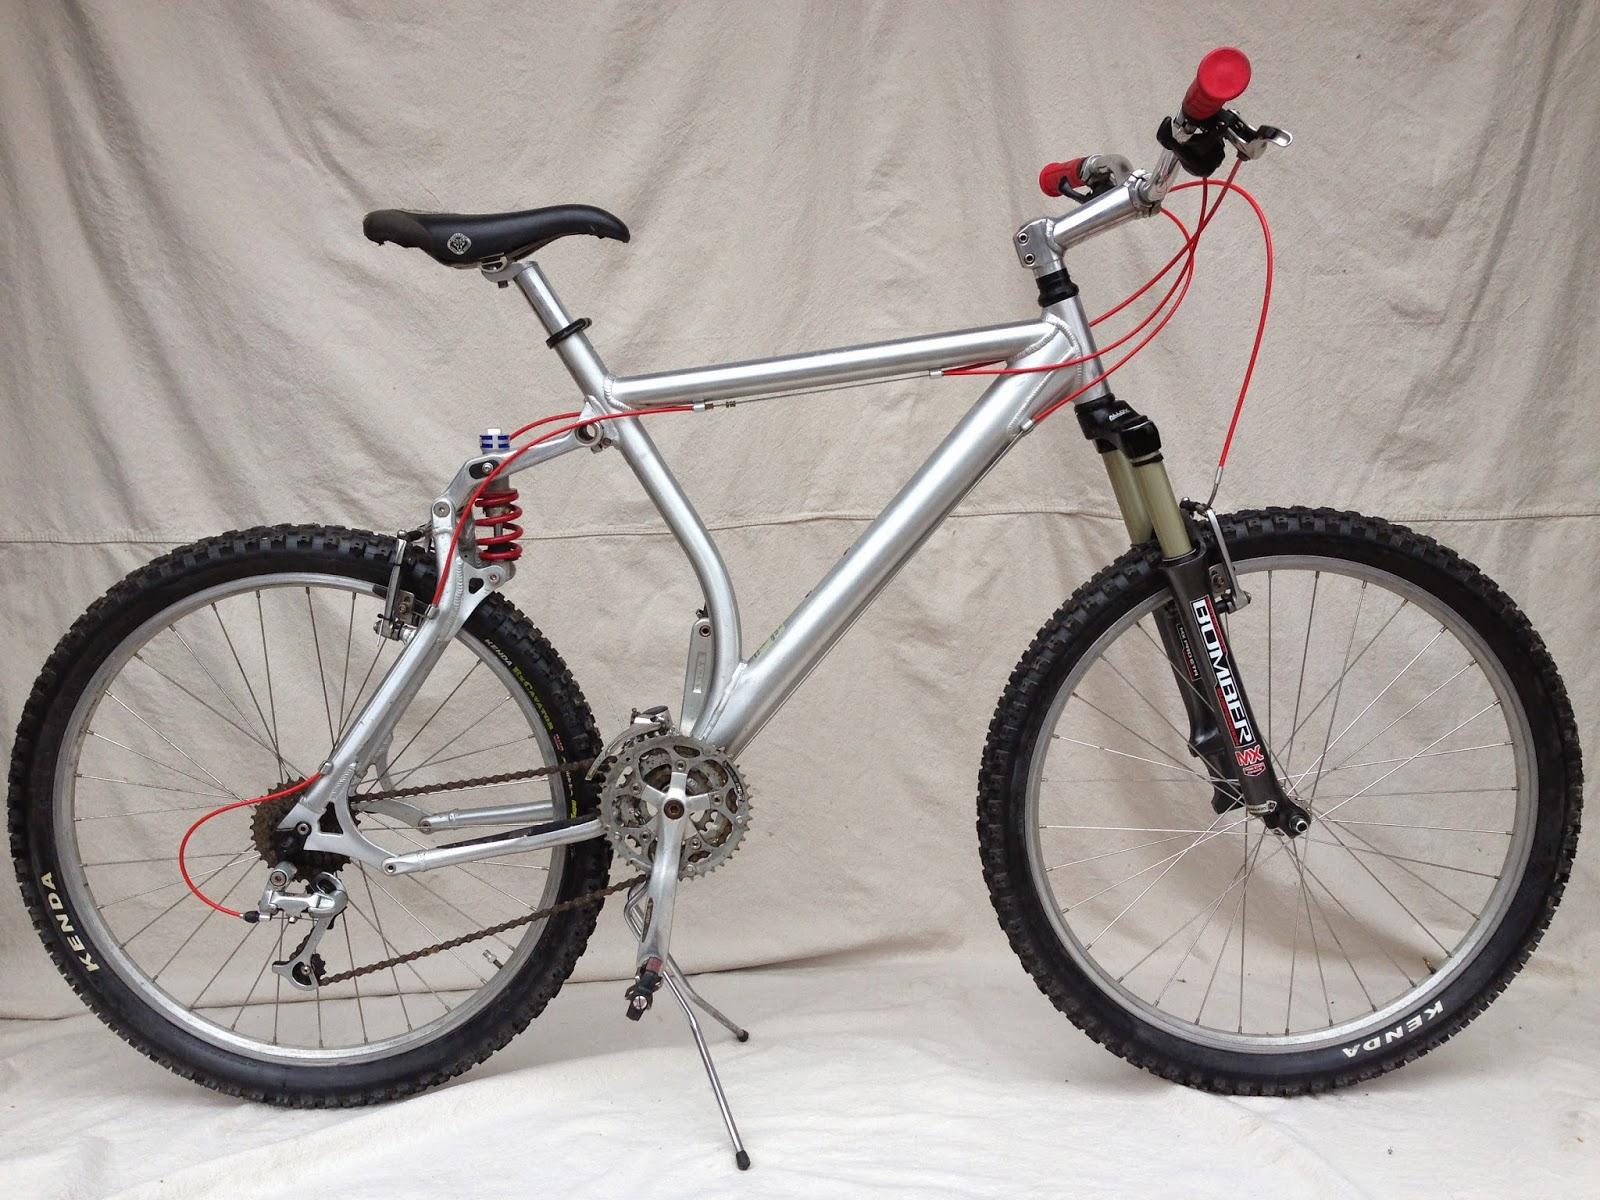 1998 gt lts 3000 full suspension mountain bike the whistle bike shop